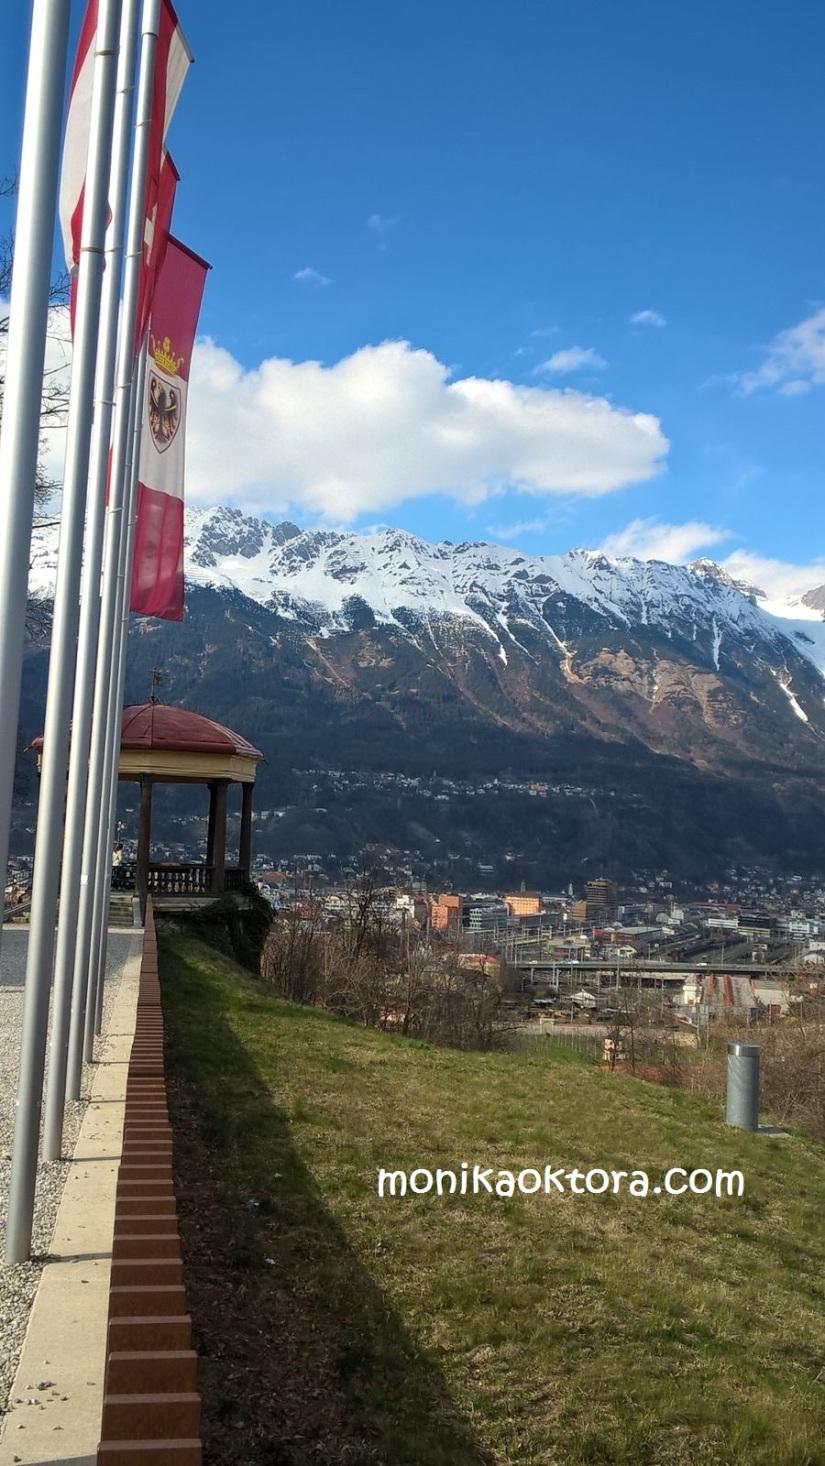 Pemandangan sekitar Tirol Panorama, itu Pavillon-nya